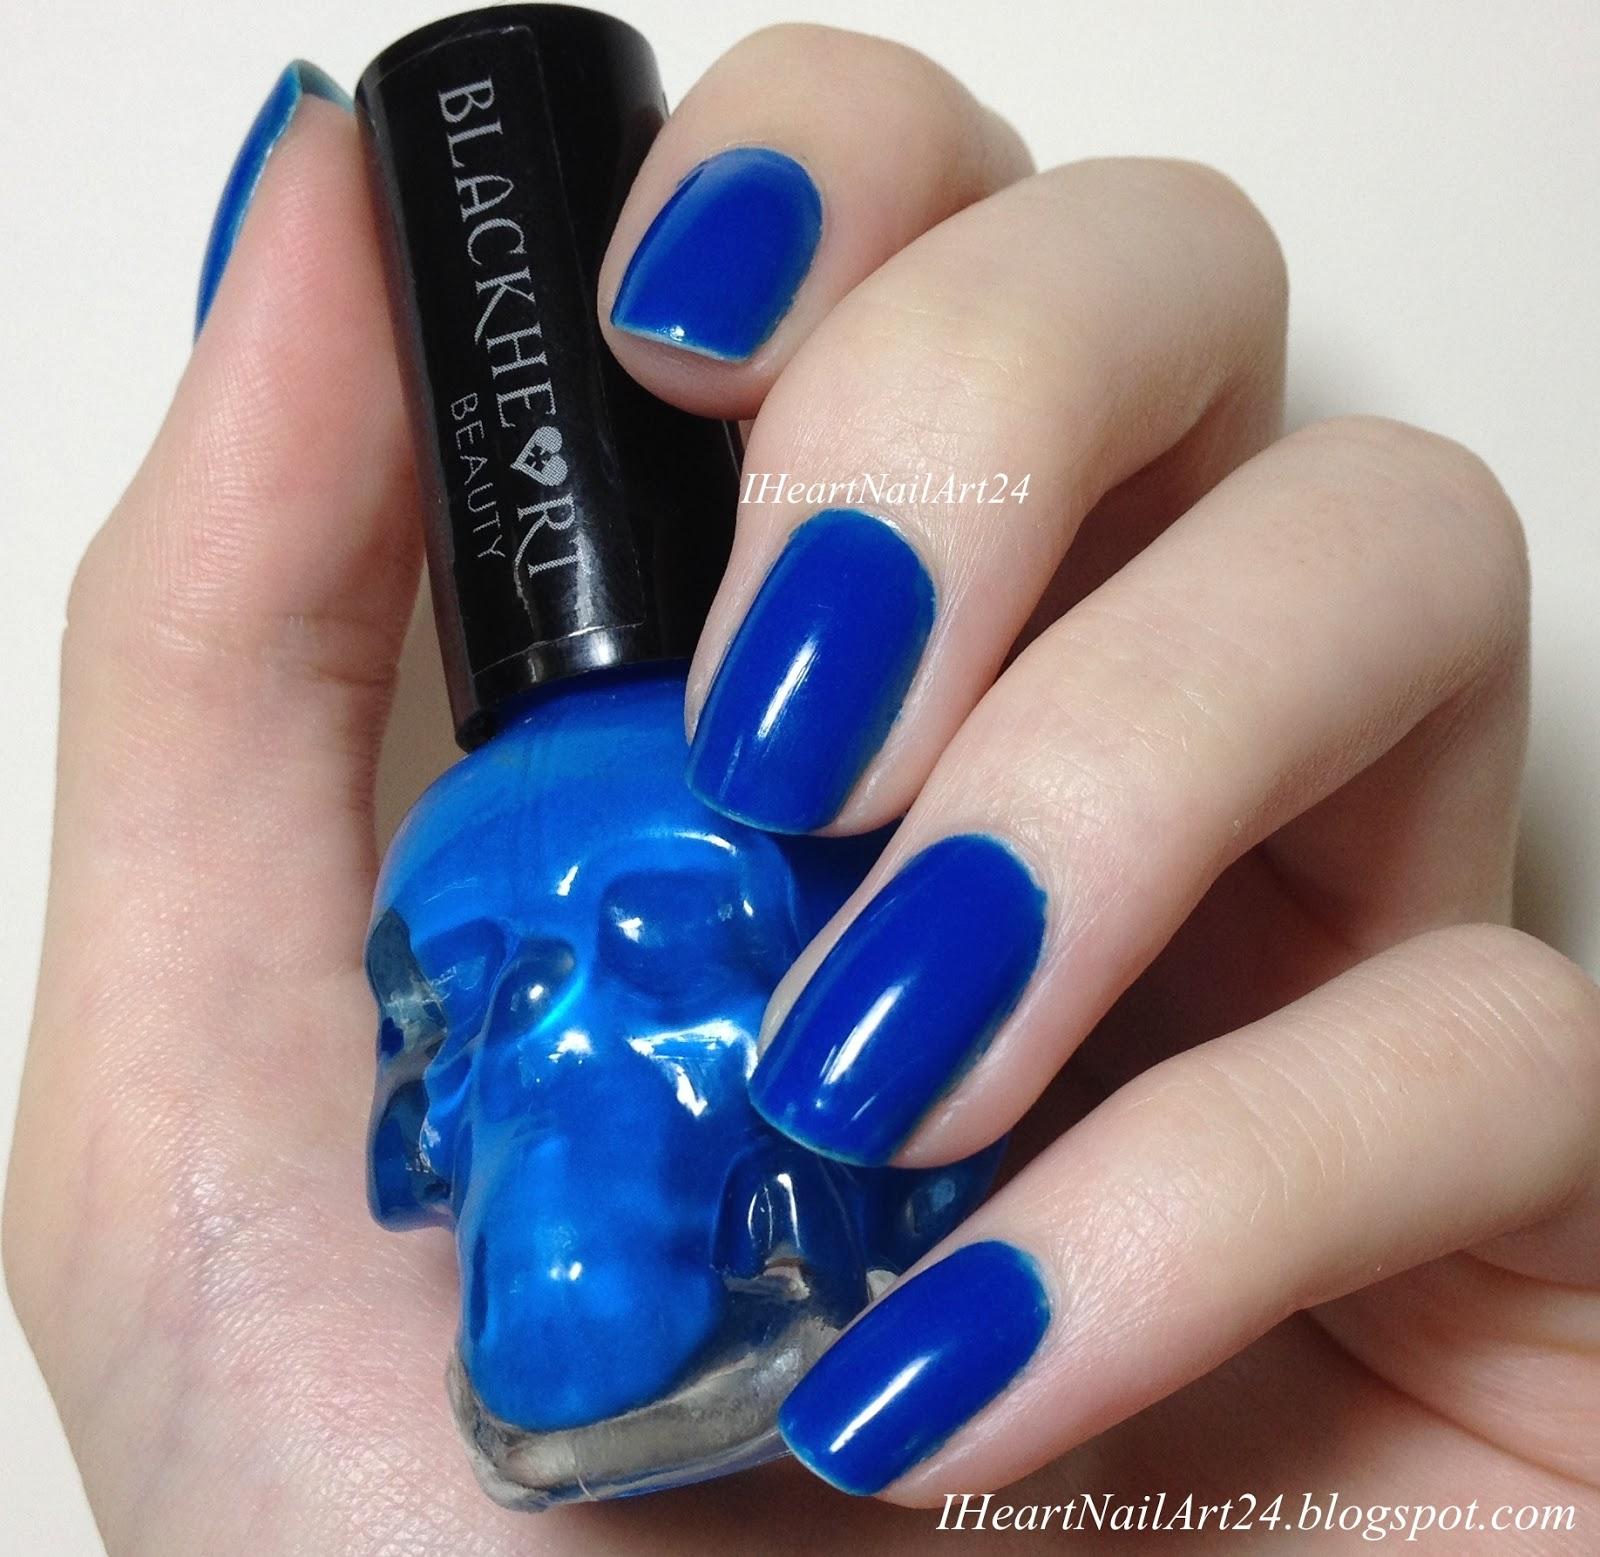 Black Heart Nail Polish: Black Heart Beauty Nail Polishes Swatches & Review